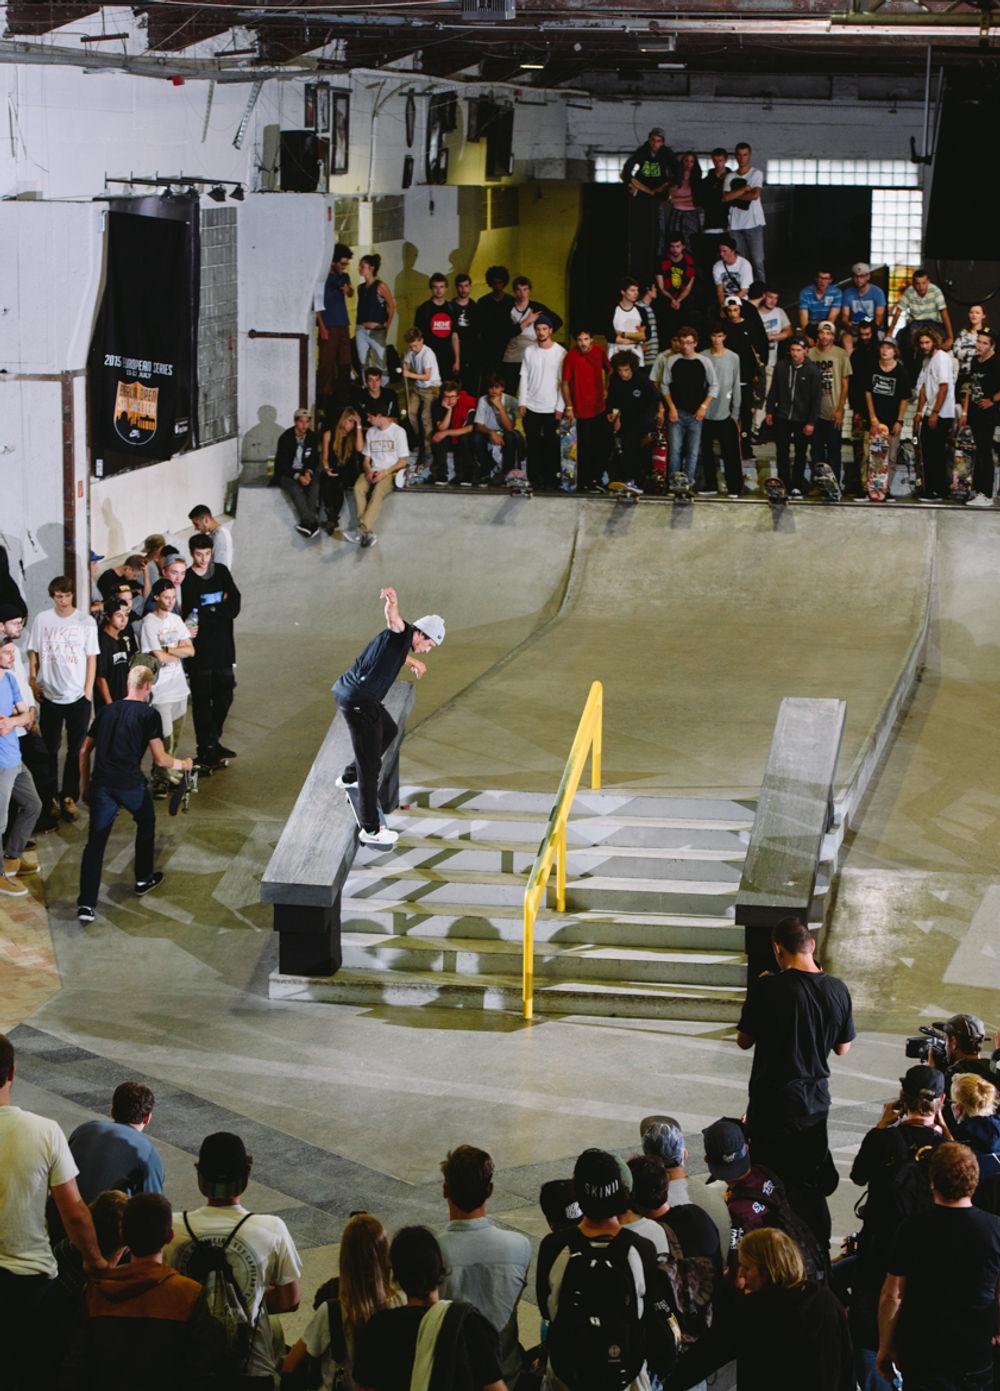 _IHC2579-Carlos-Ribeiro-Switch-Bs-Smith-Nike-SB-Berlin-Open-Day-2-July-2015-Photographer-Maksim-Kalanep